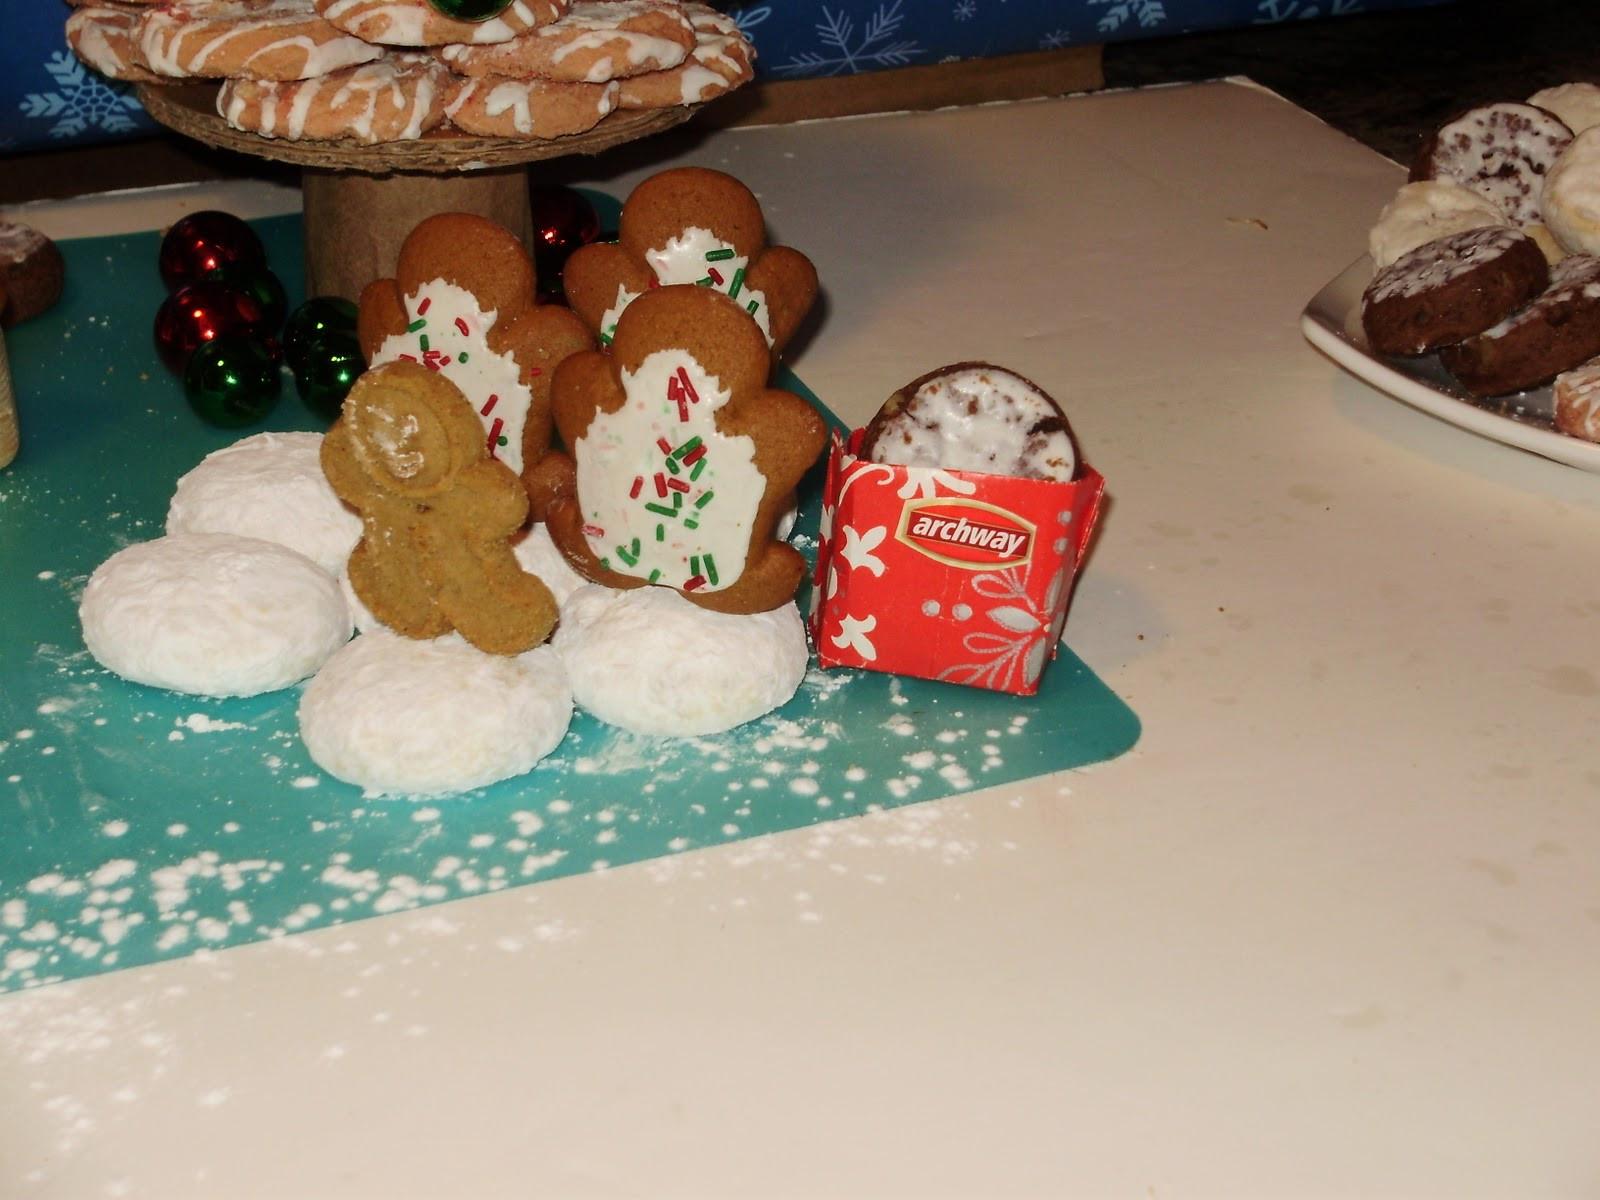 Archway Christmas Cookies  I LOVE your scene Chris So cute I kind of wish I had